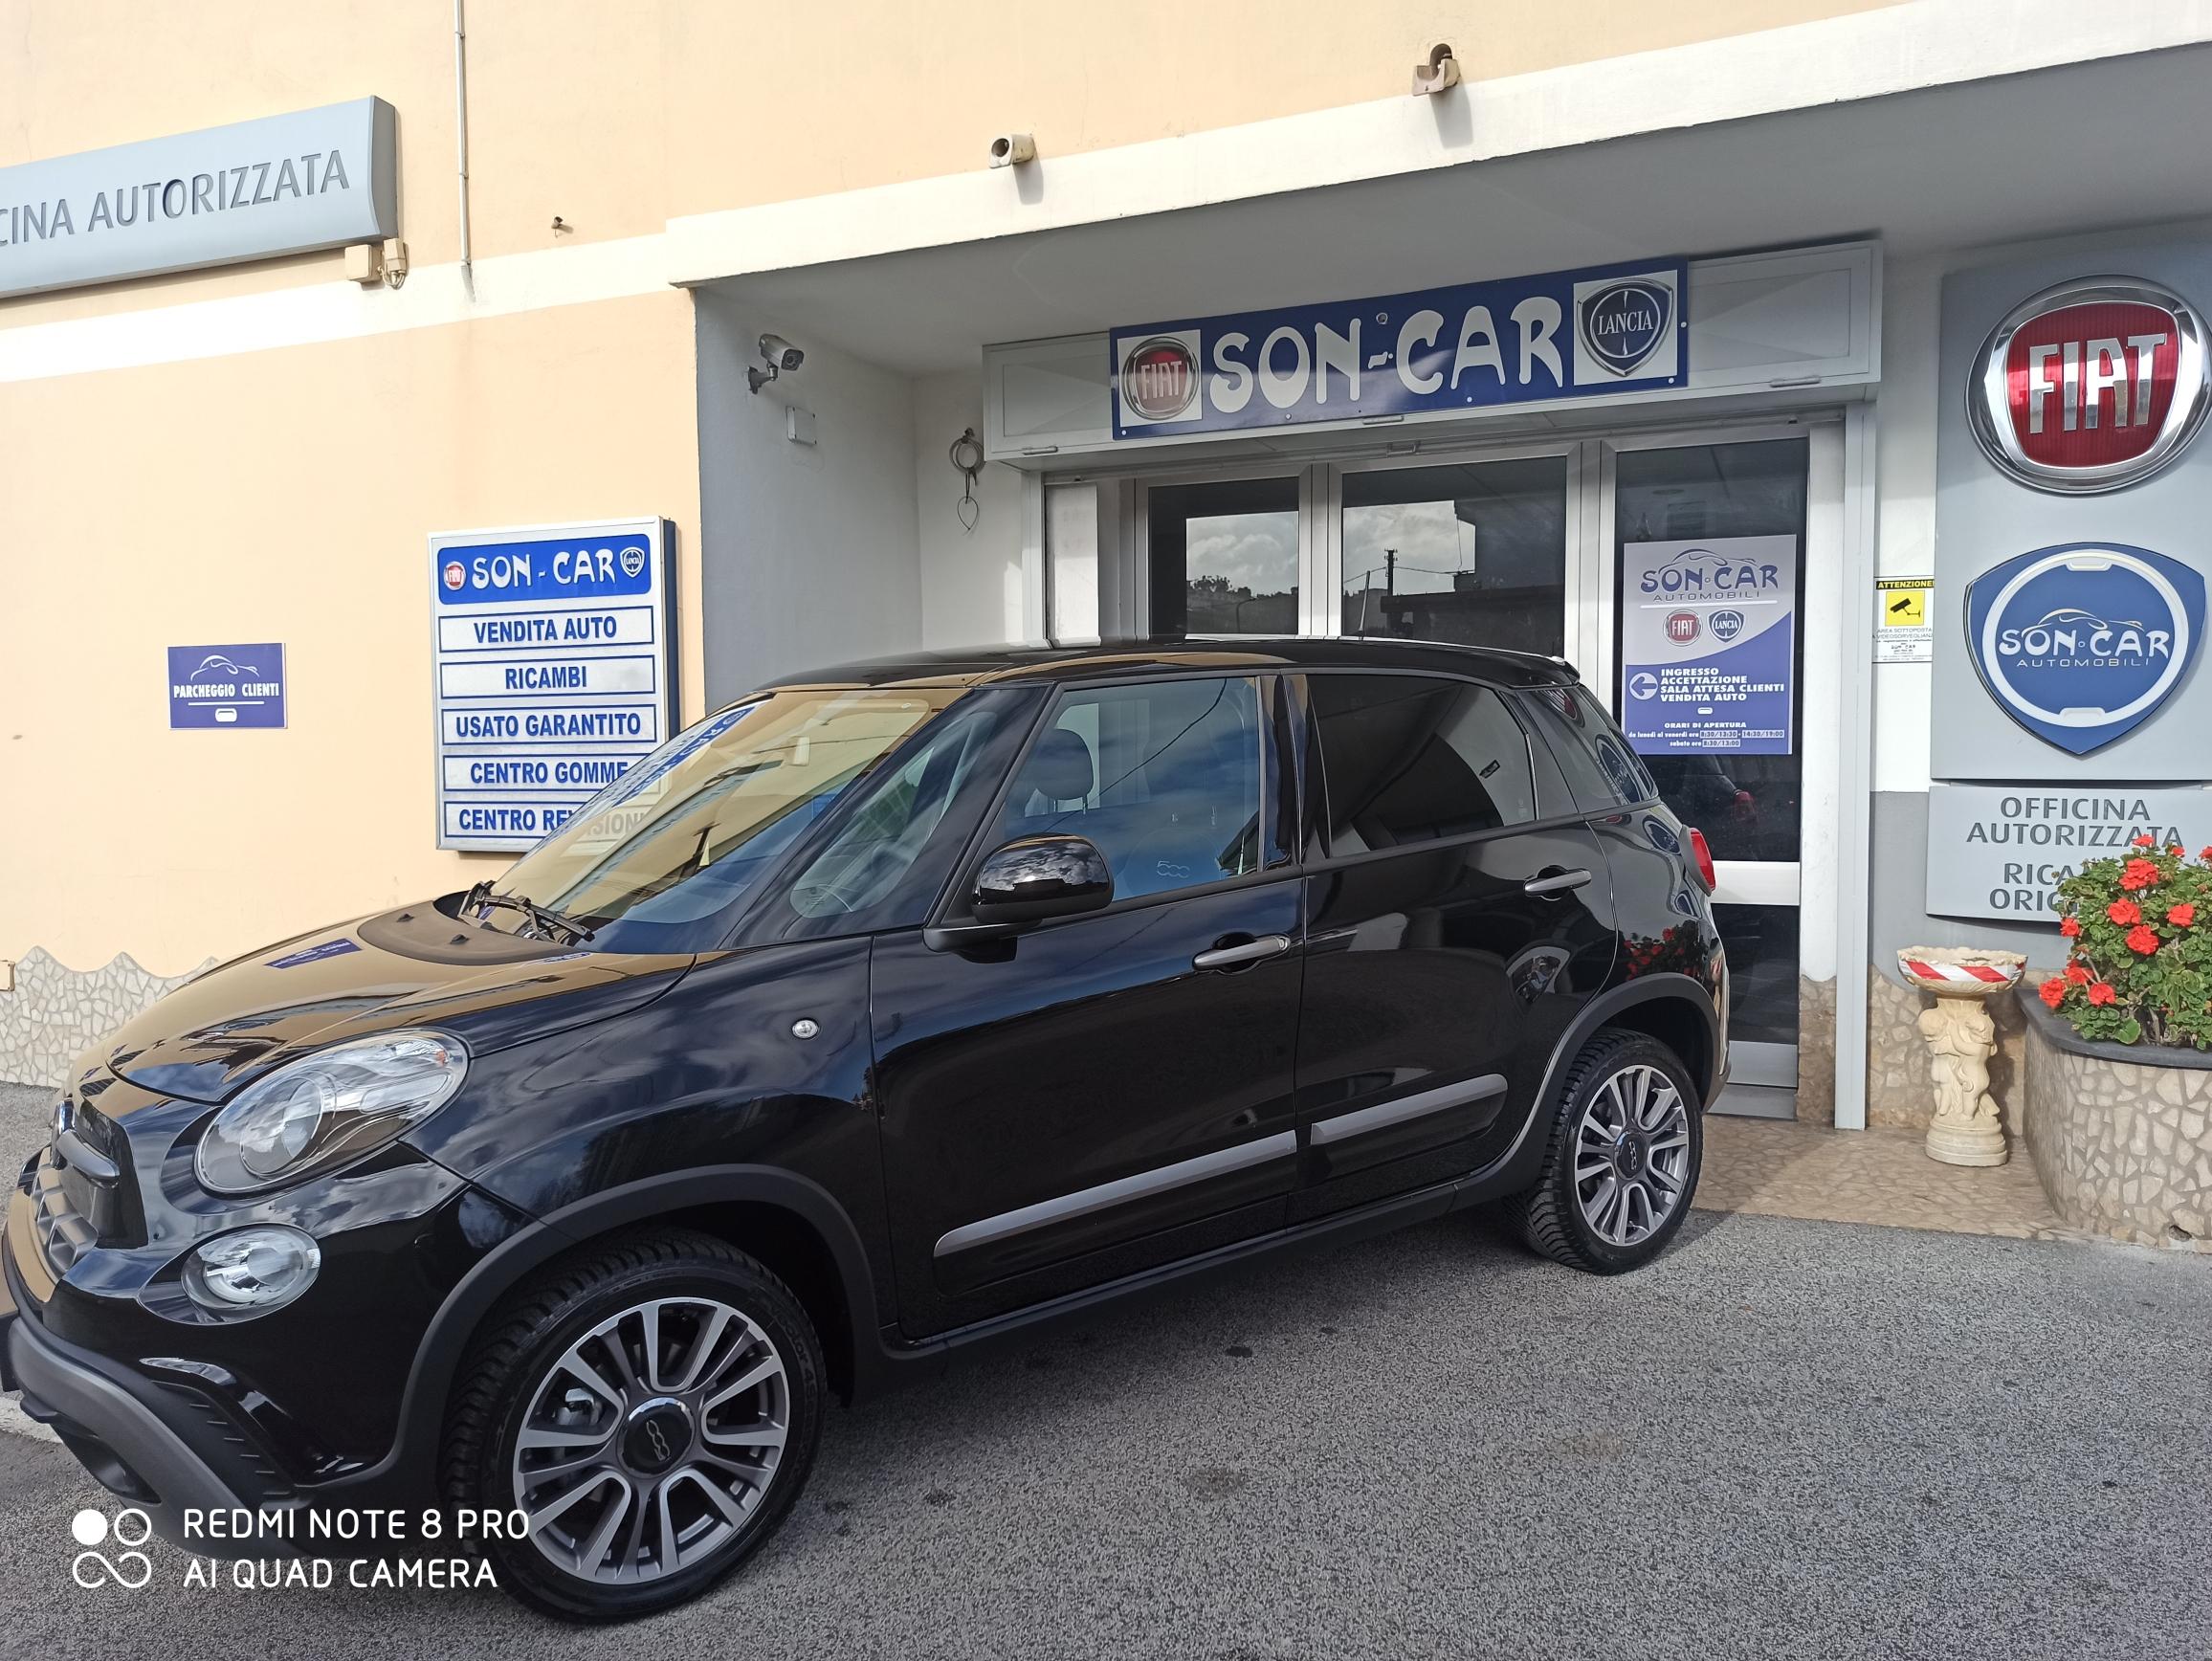 SON CAR  FIAT 500 L CROSS 1.3 MULTIJET 95 CV DA 13900,00 A €14500,00